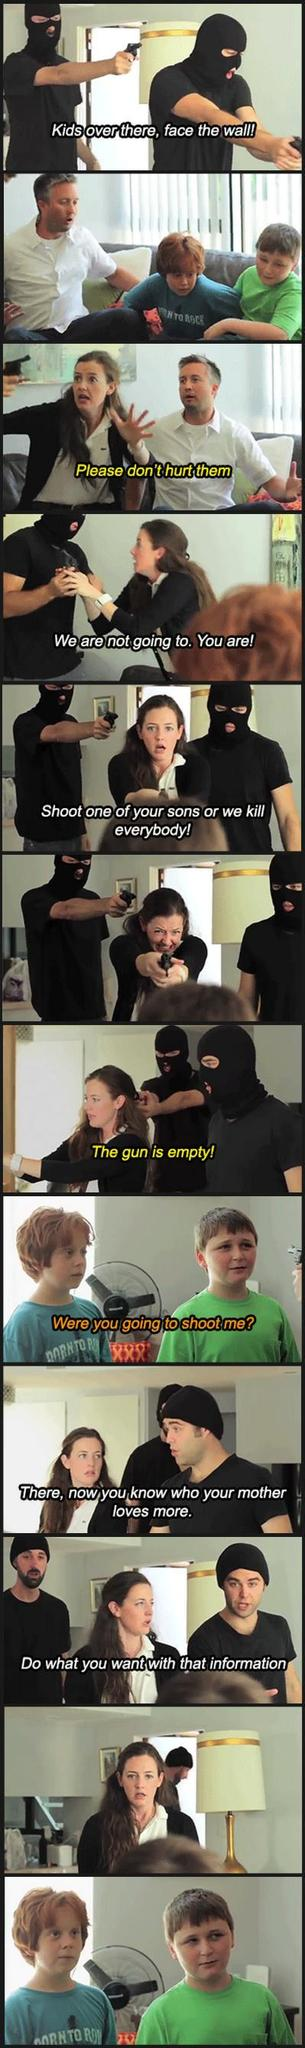 Knowledge - meme